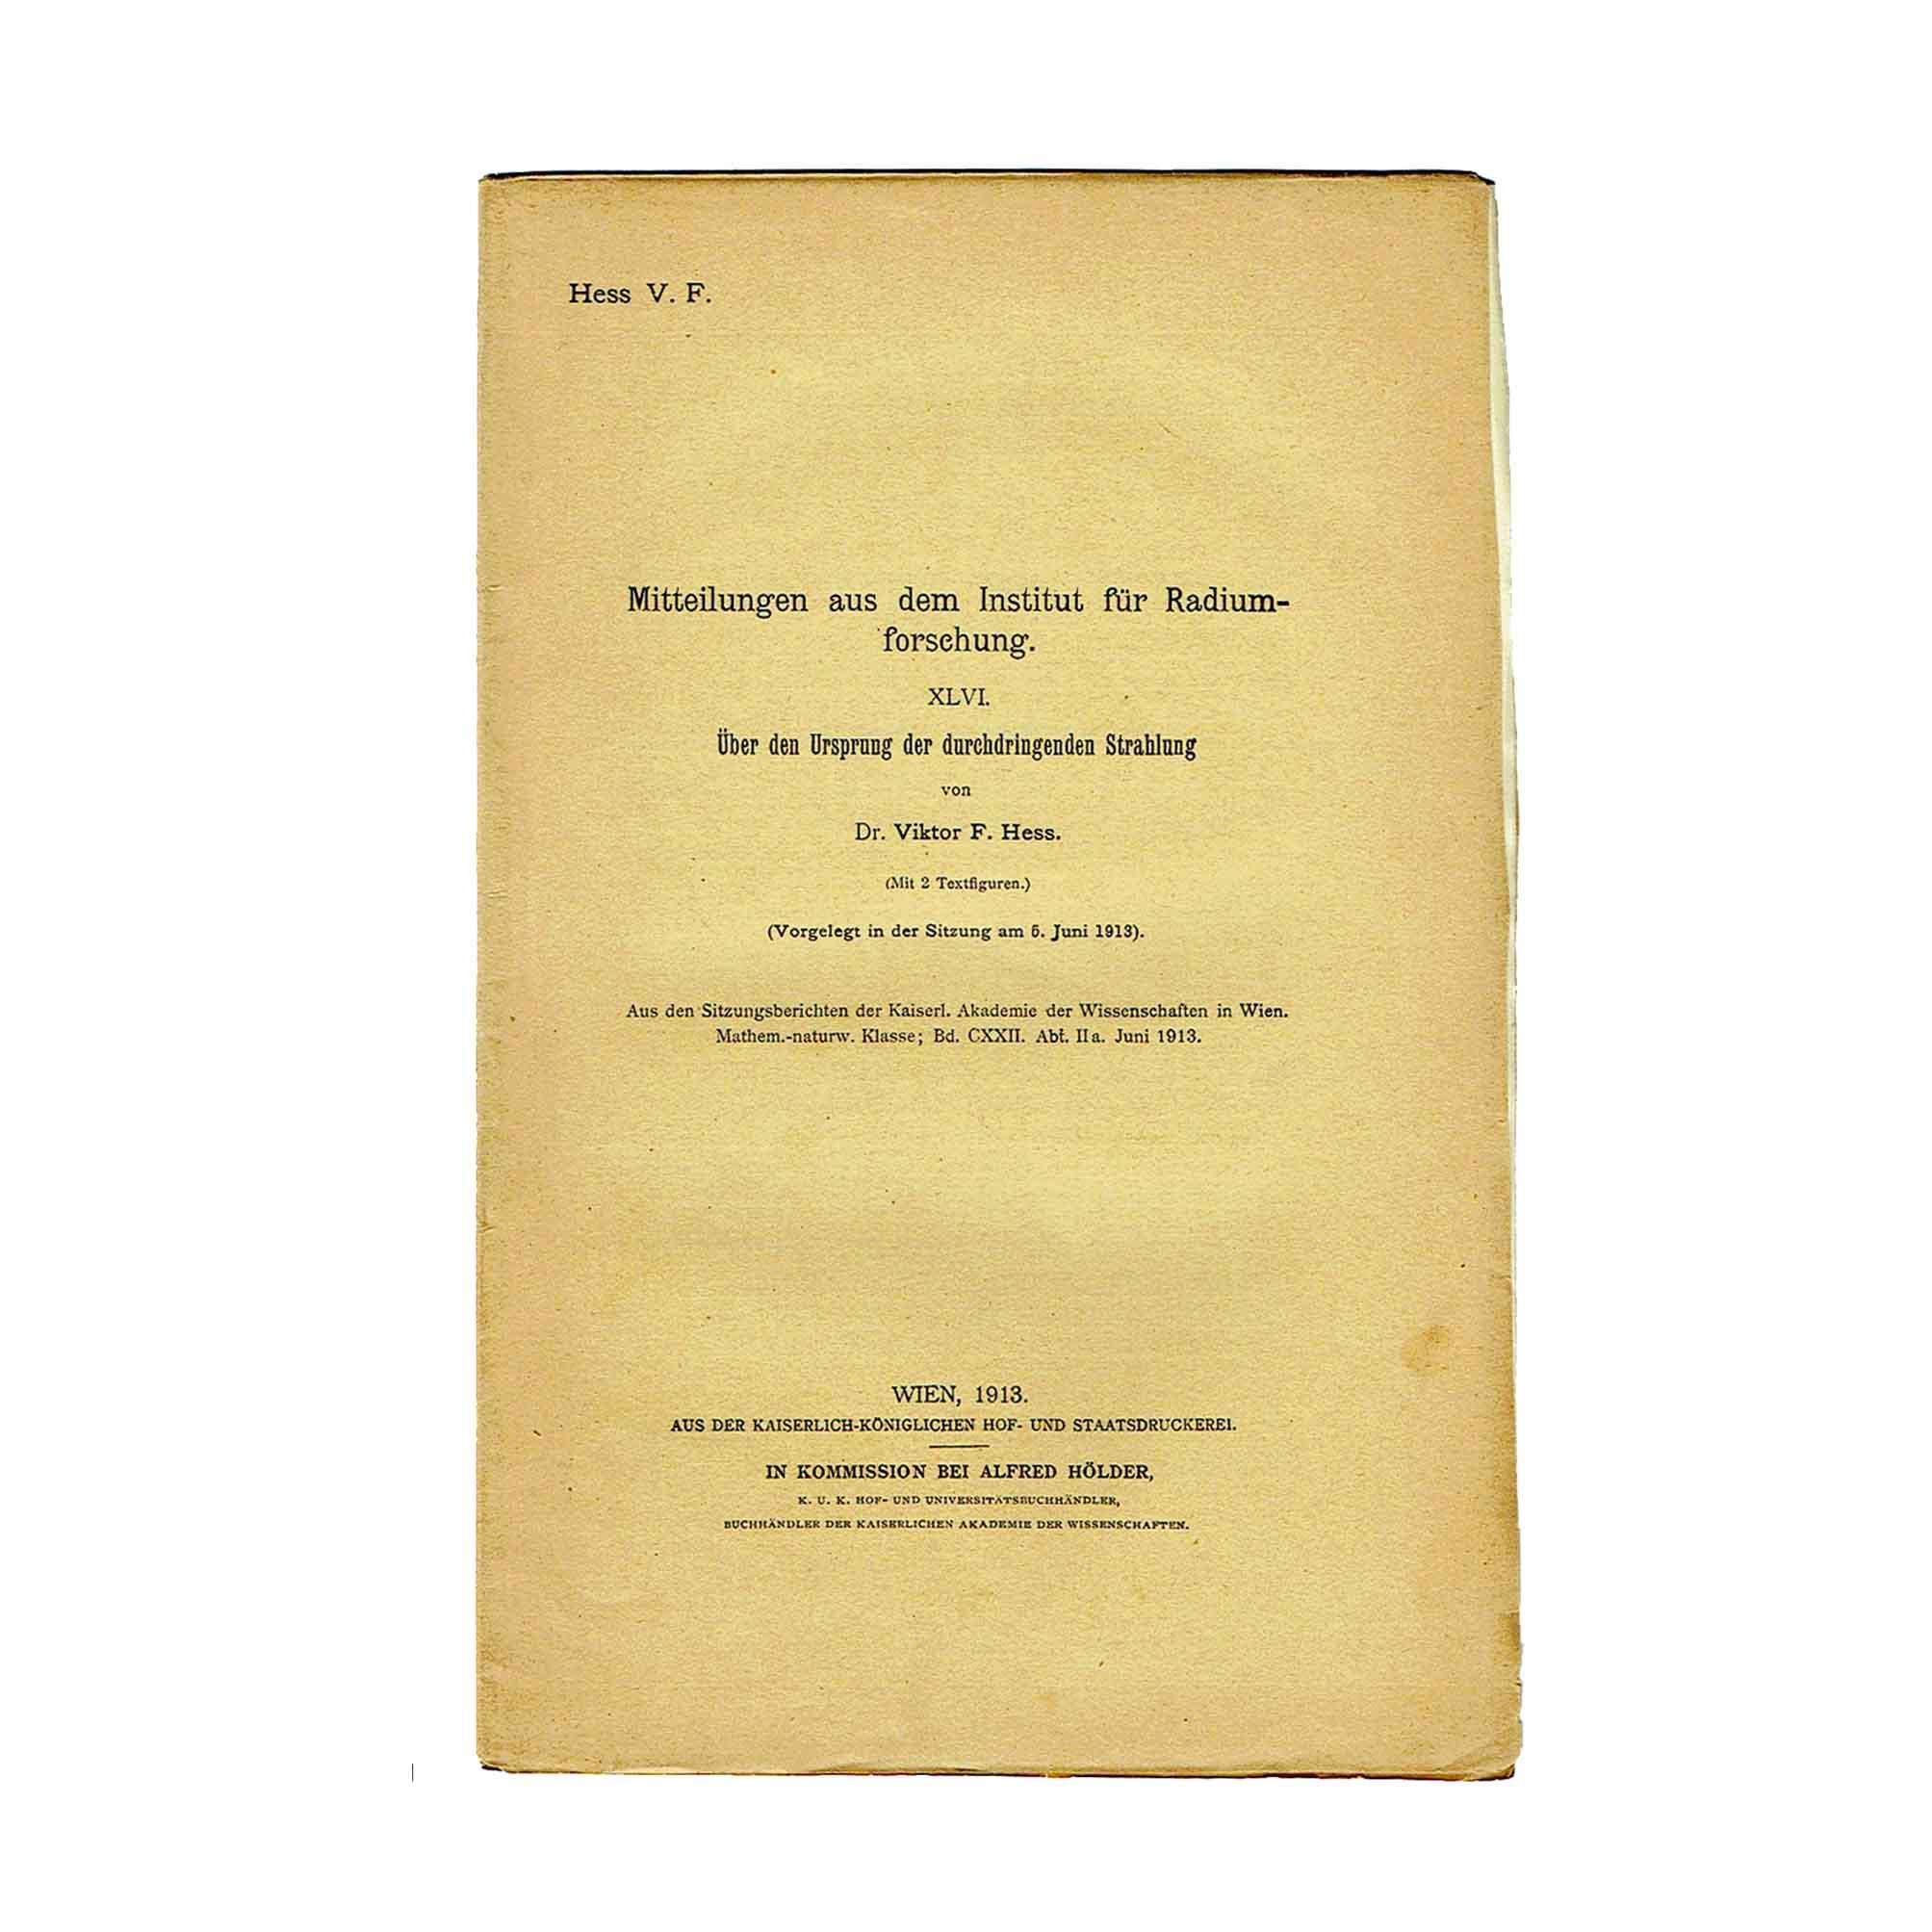 5907K-Hess-Ursprung-Strahlung-1913-Cover-recto-22-Titles-Cosmic-Radiology-free-N.jpg